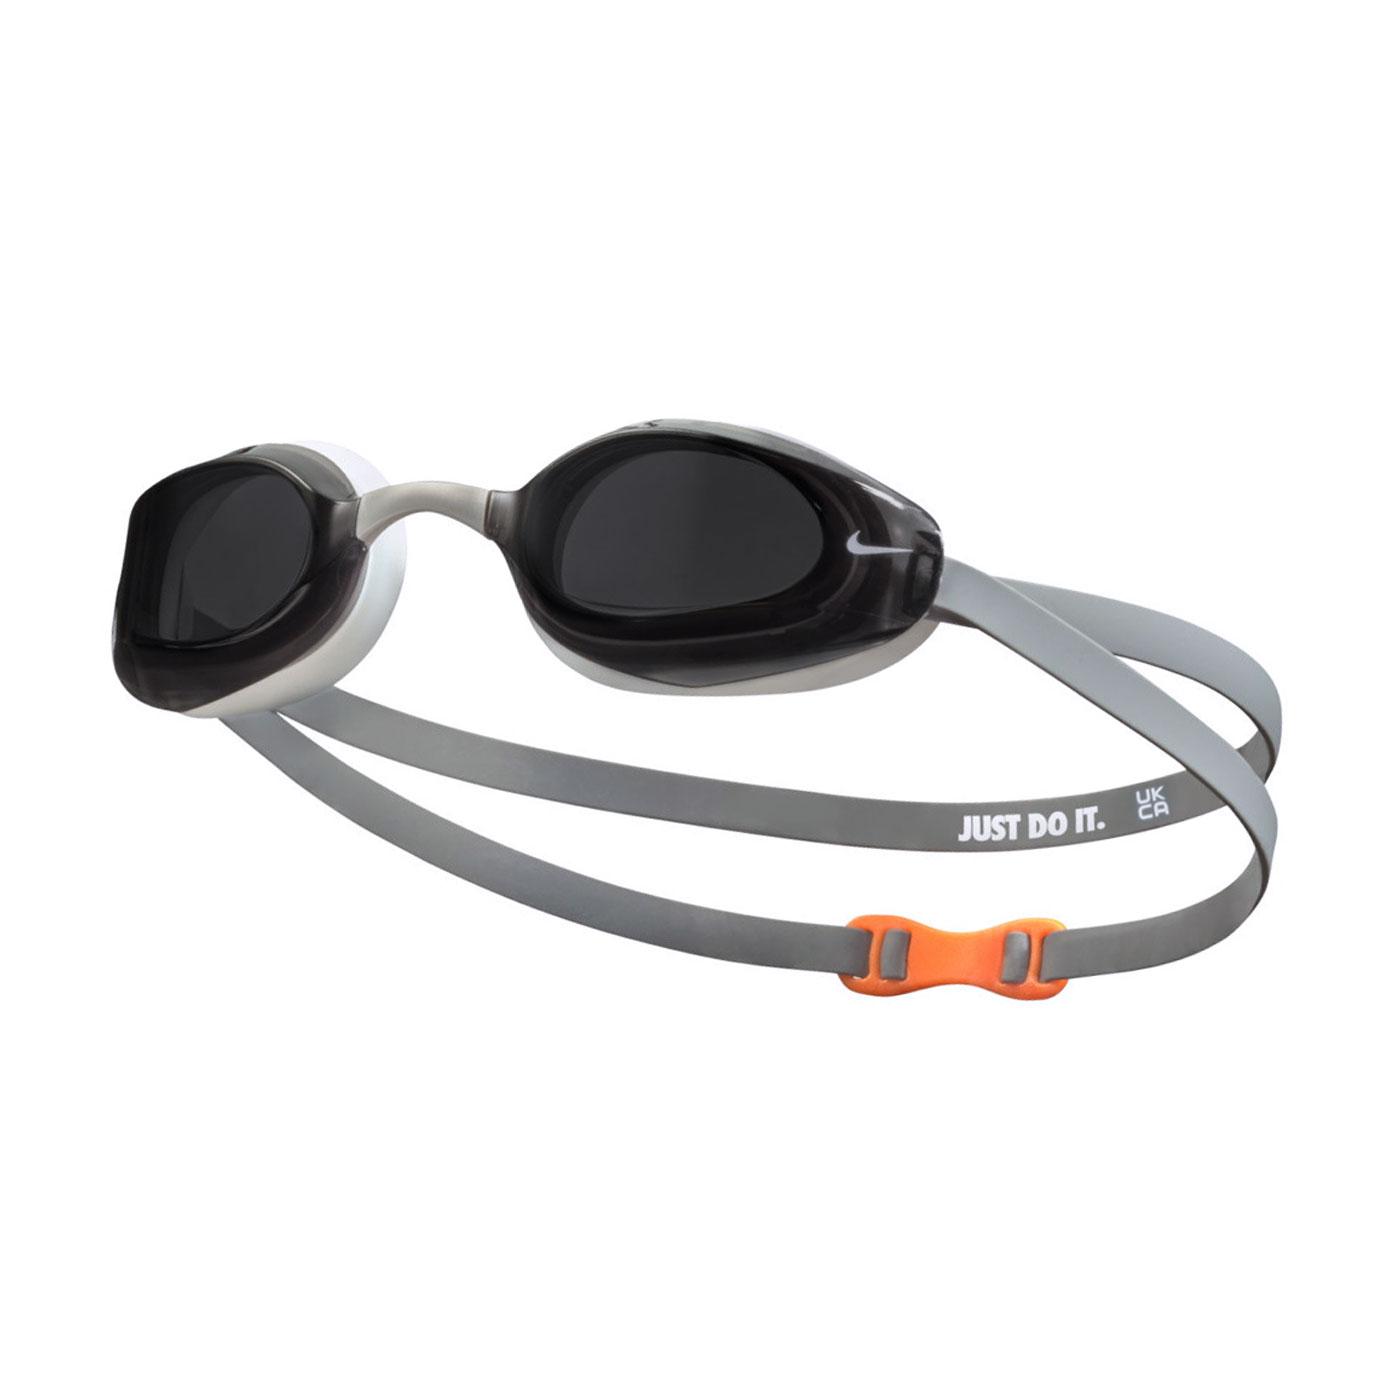 NIKE 成人專業型泳鏡 NESSA177-014 - 黑白